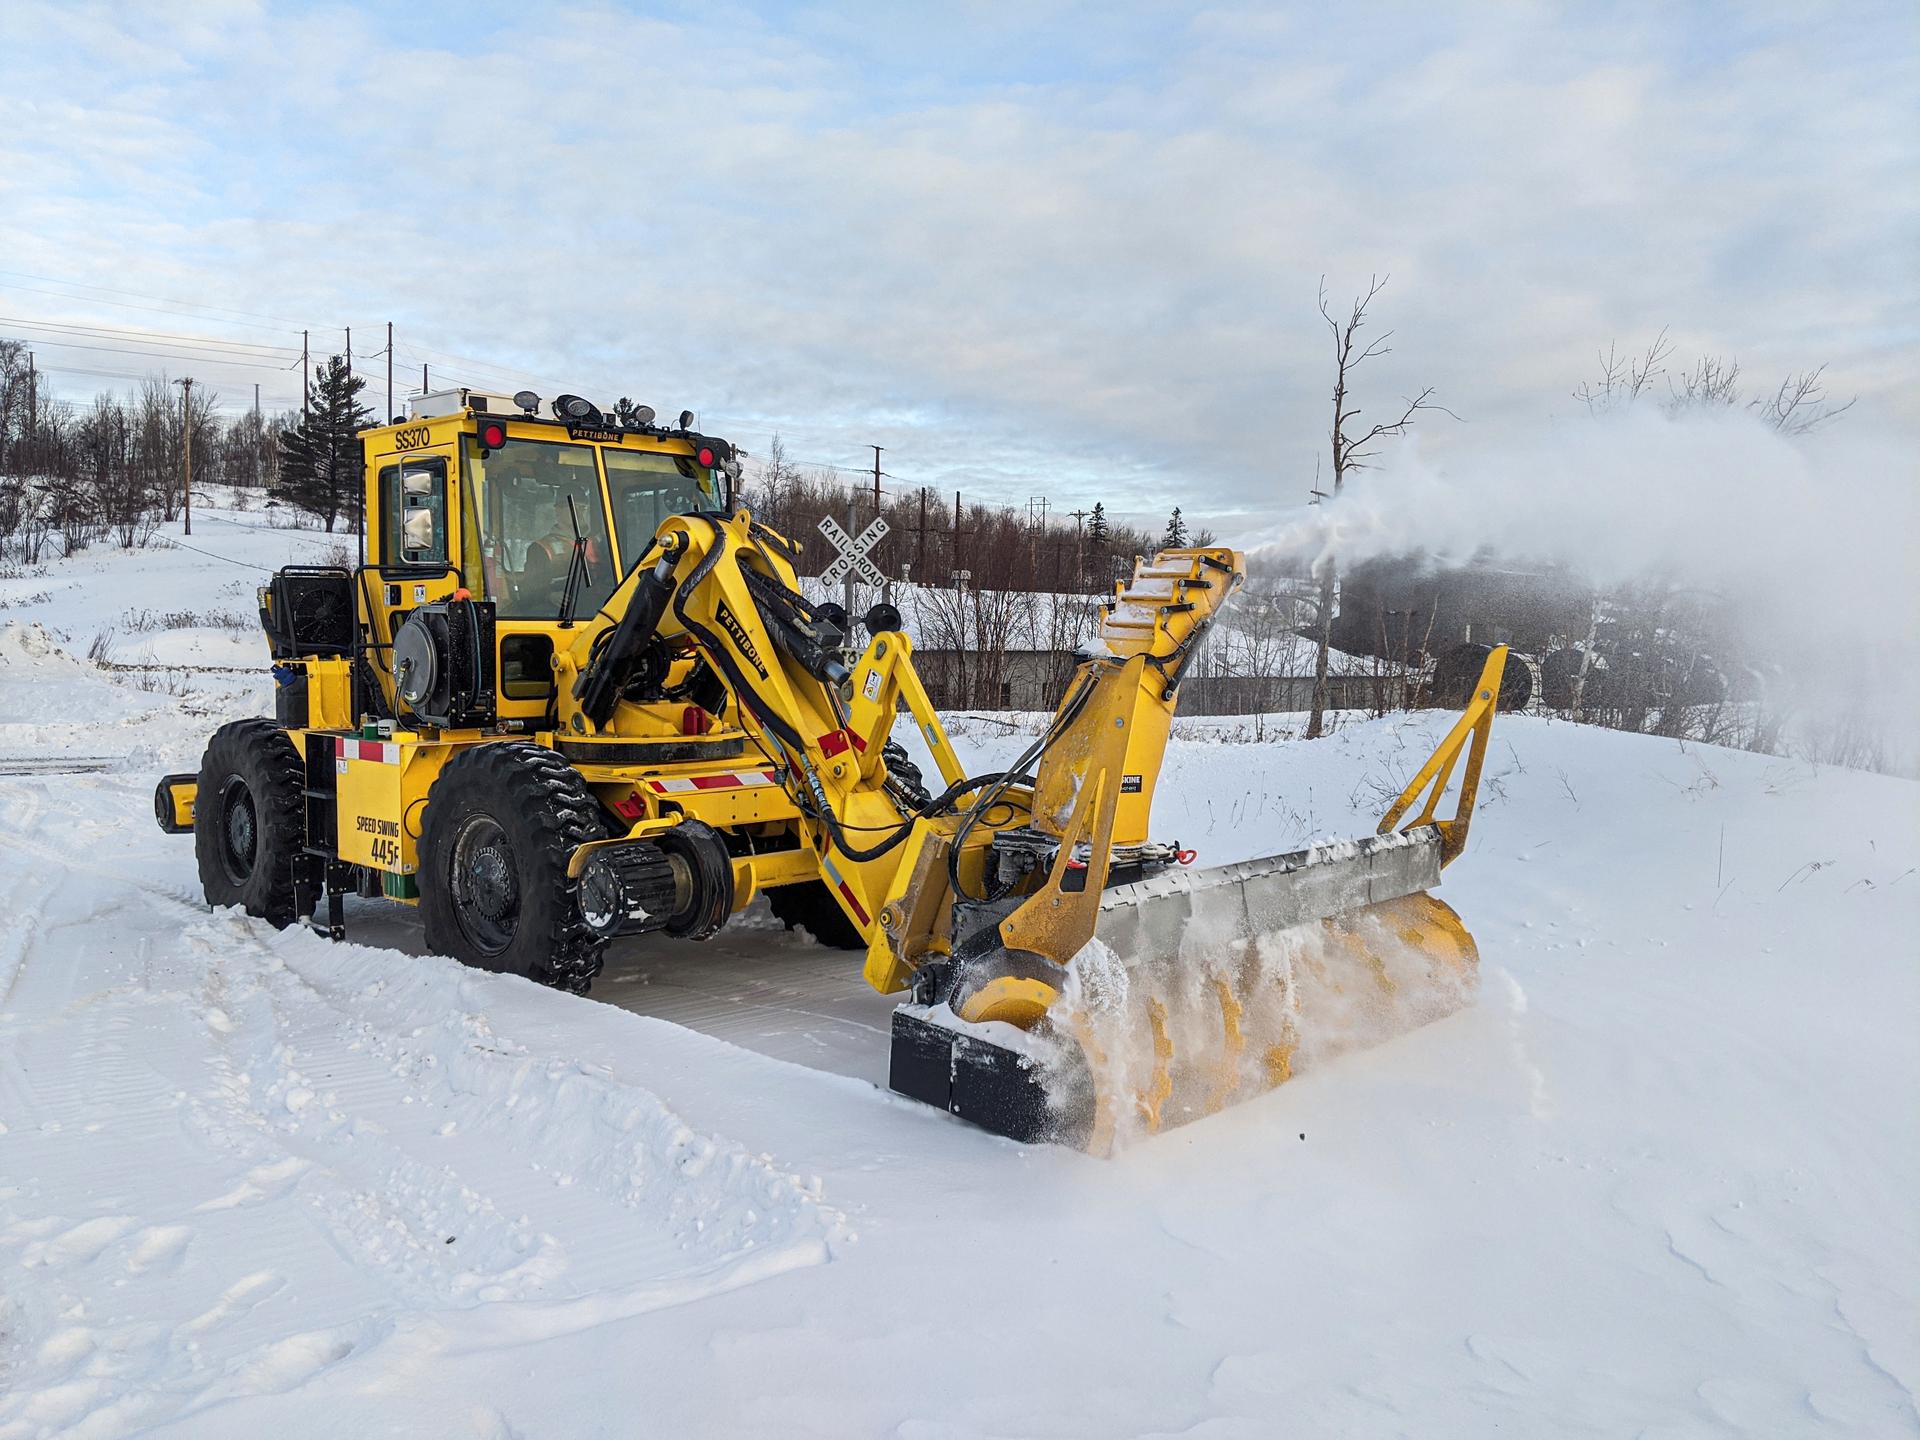 Pettibone SpeedSwing 445F snowblower